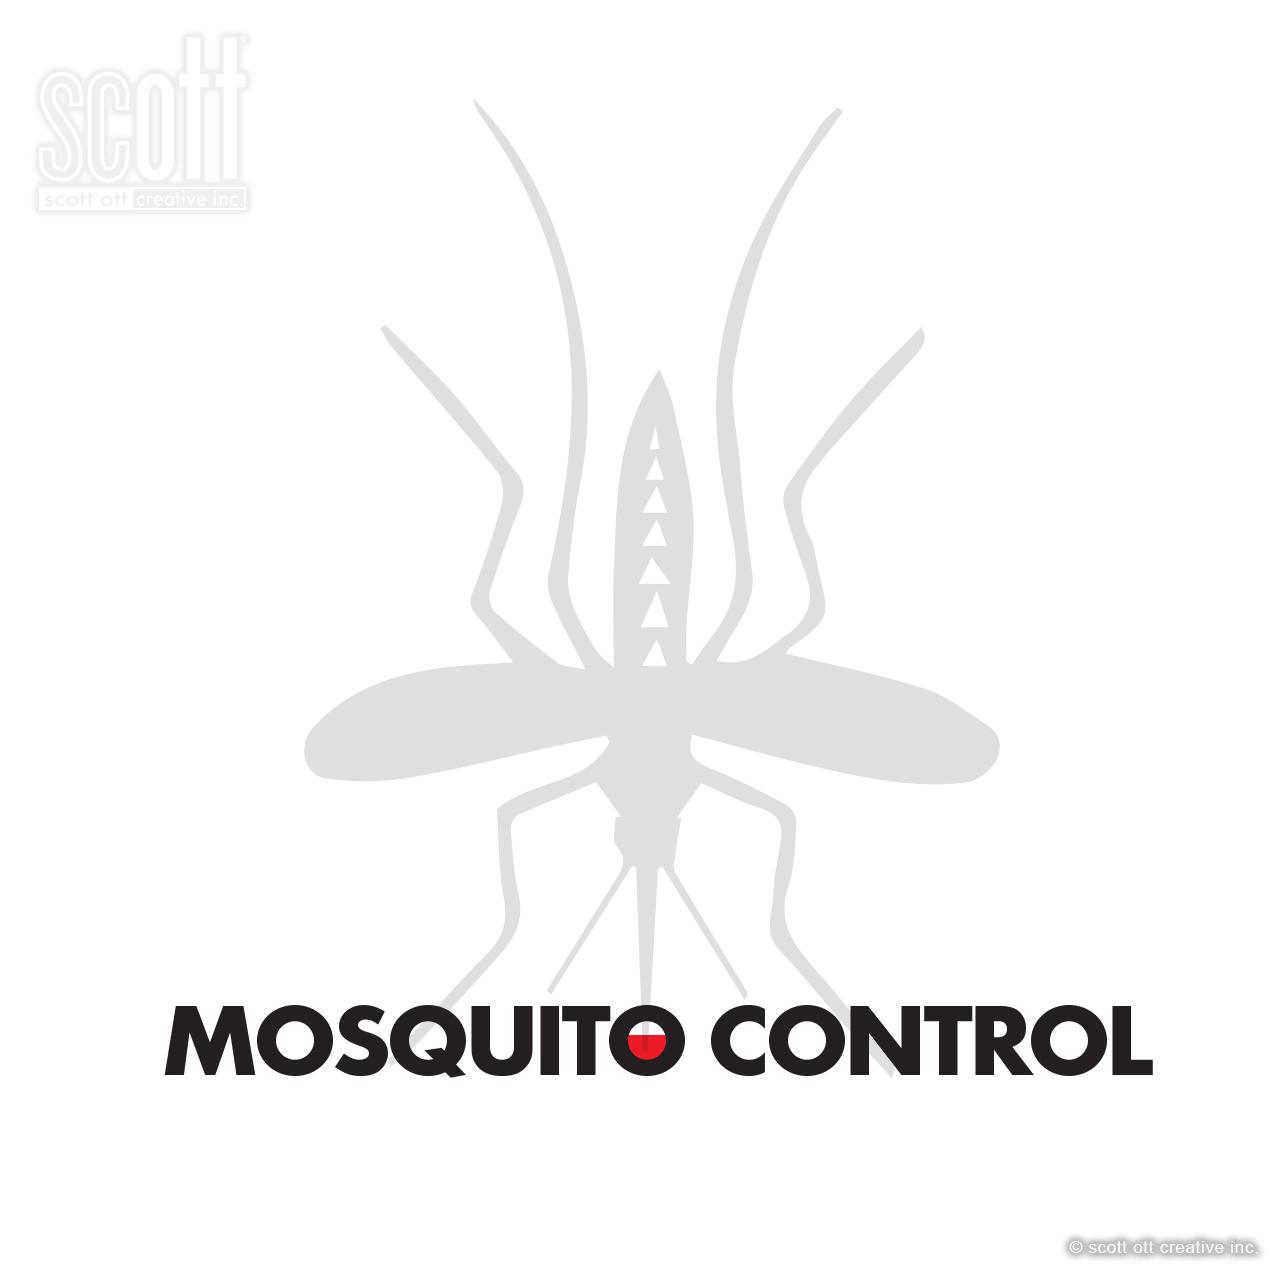 mosquito control - scott ott creative inc.